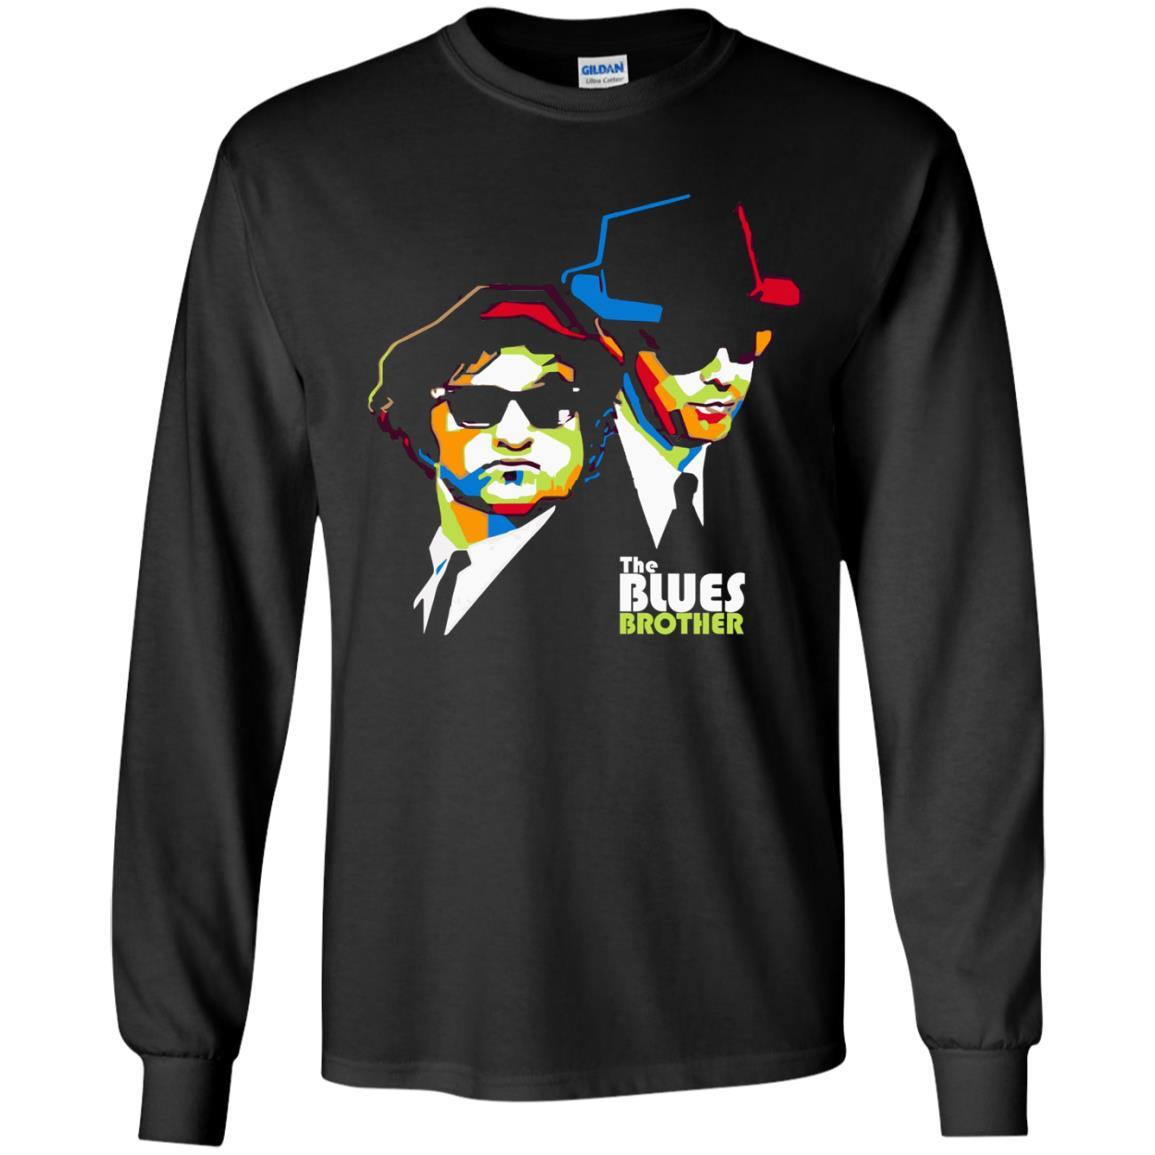 image 641 - The Blues Brother Shirt, Sweatshirt, Hoodie